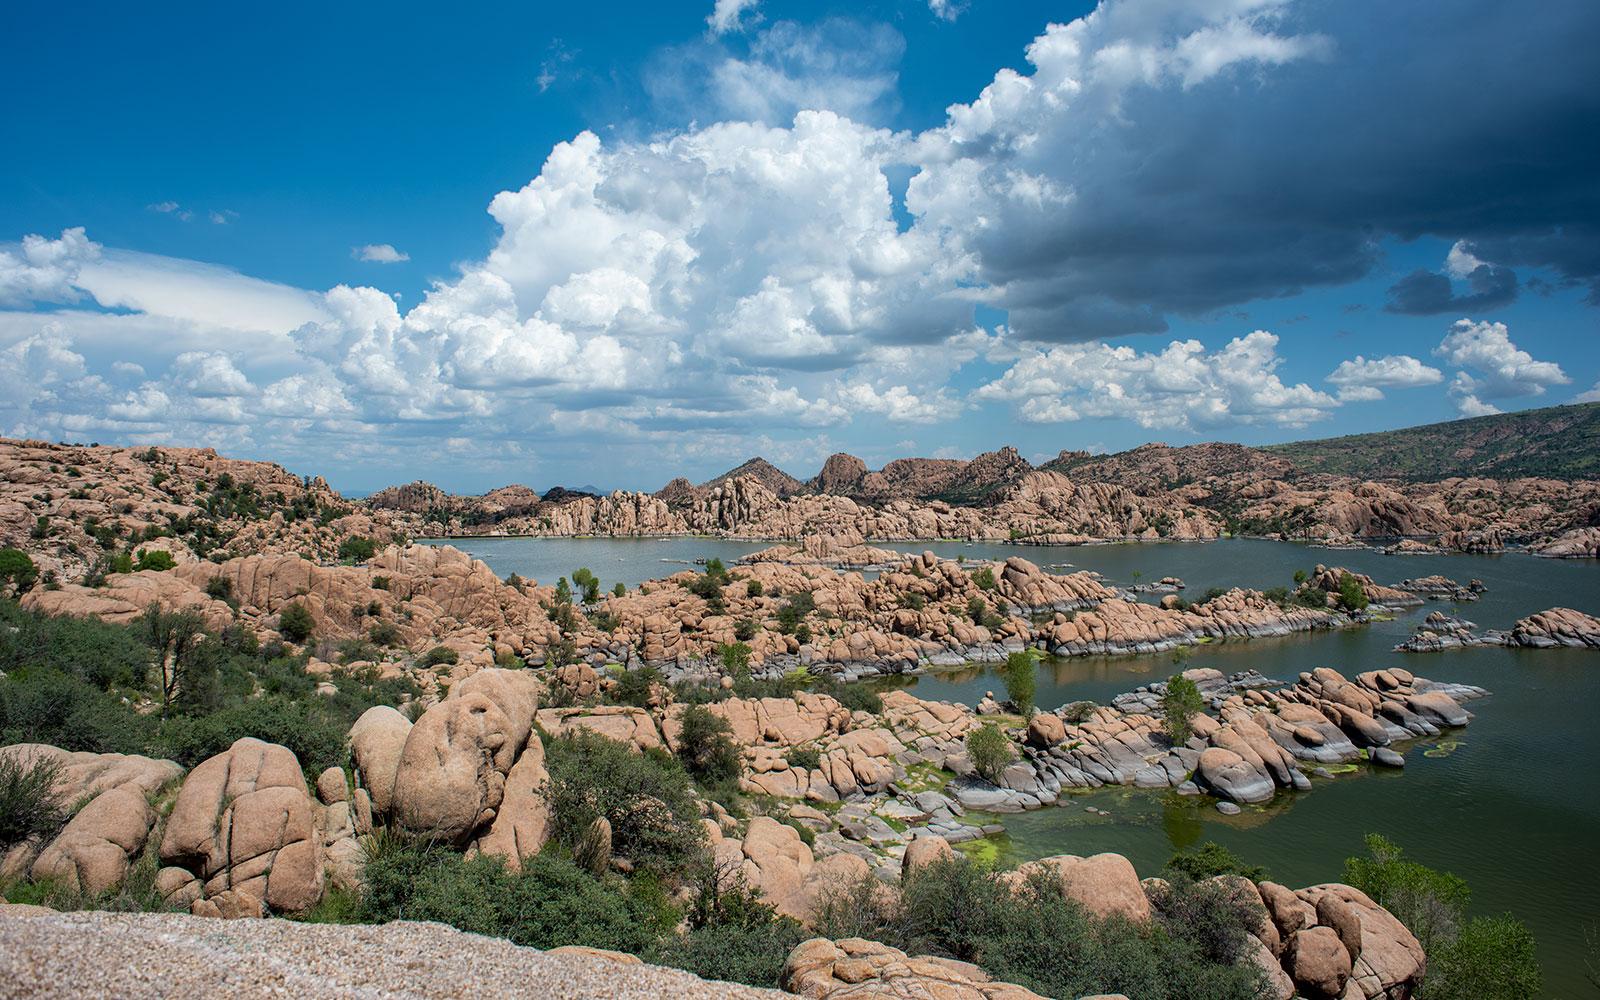 Watson Lake is a reservoir in Arizona's rocky high desert